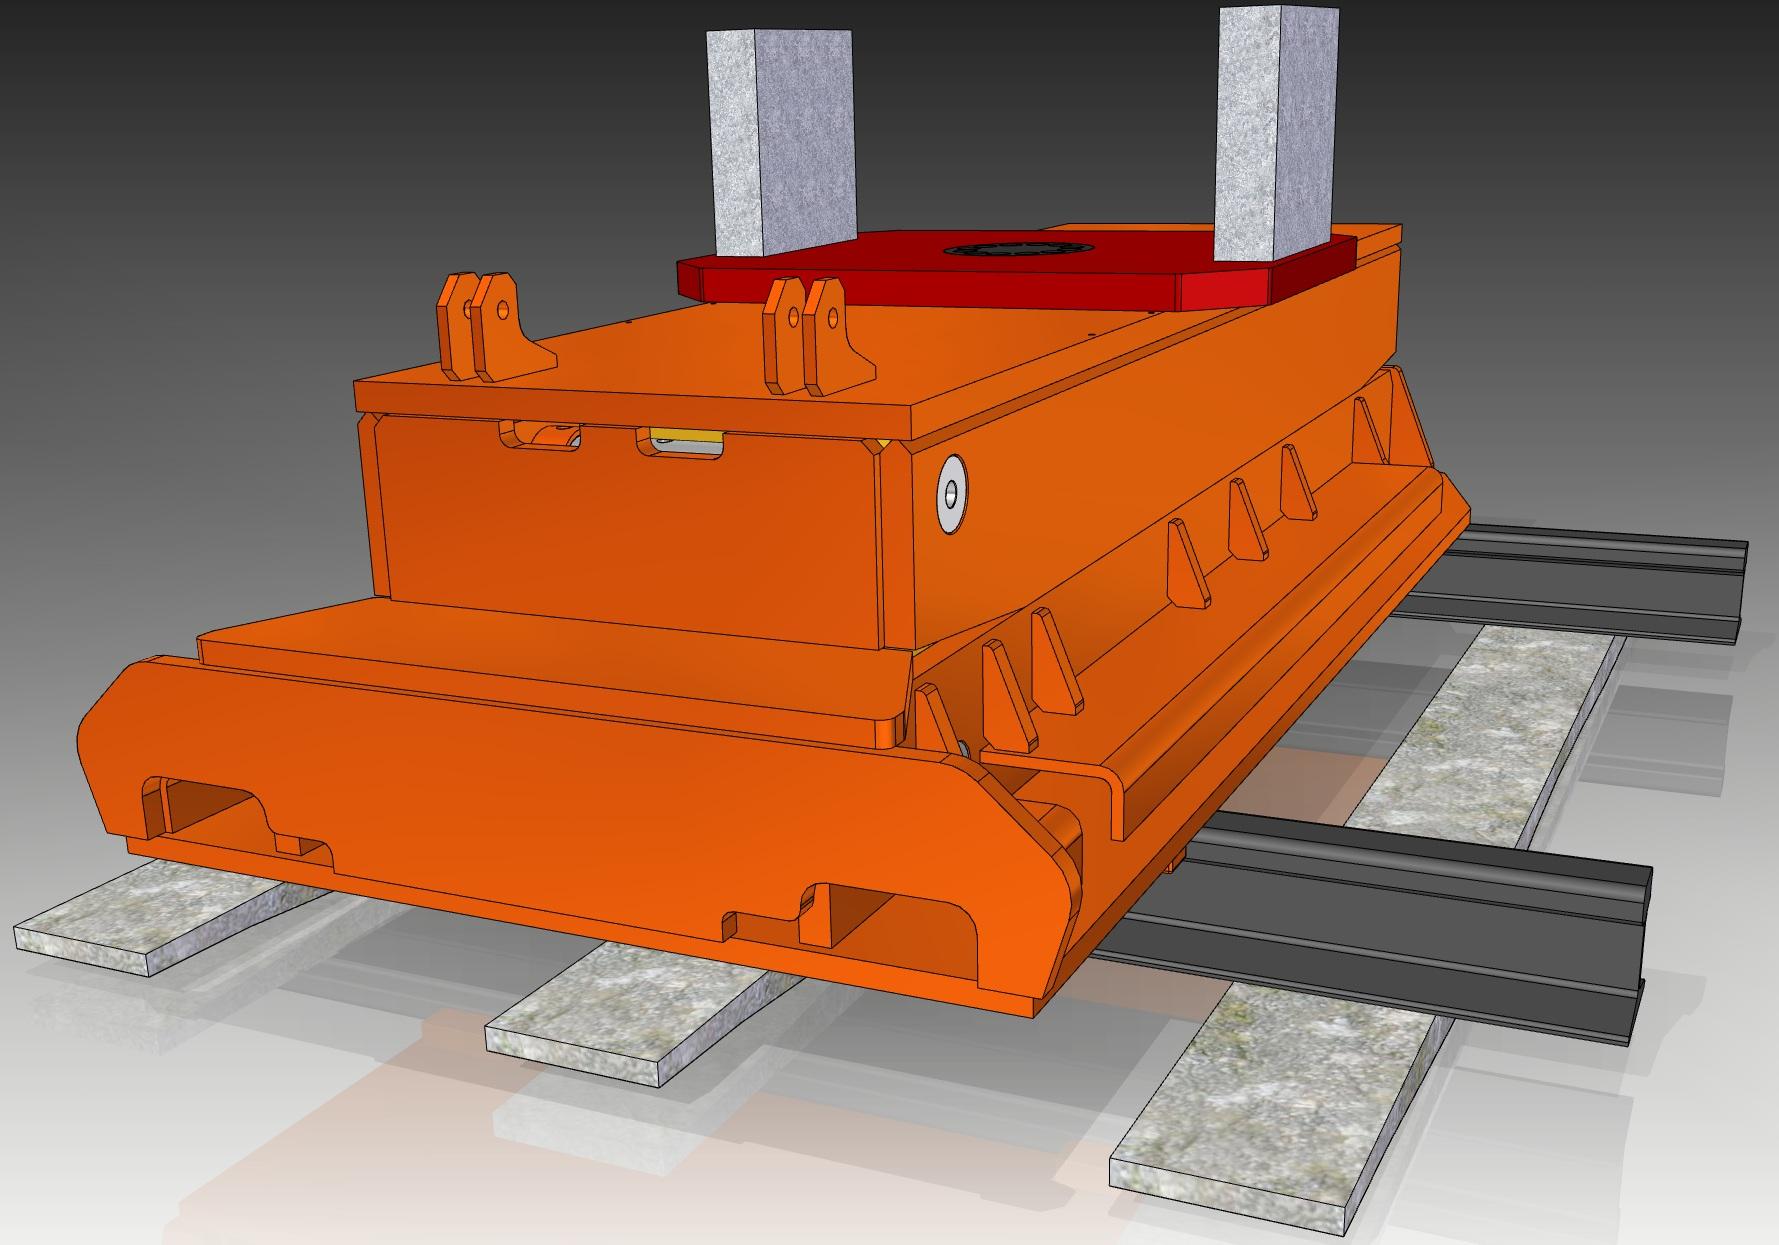 35 Ton Rail Car Jack with Rotating Base